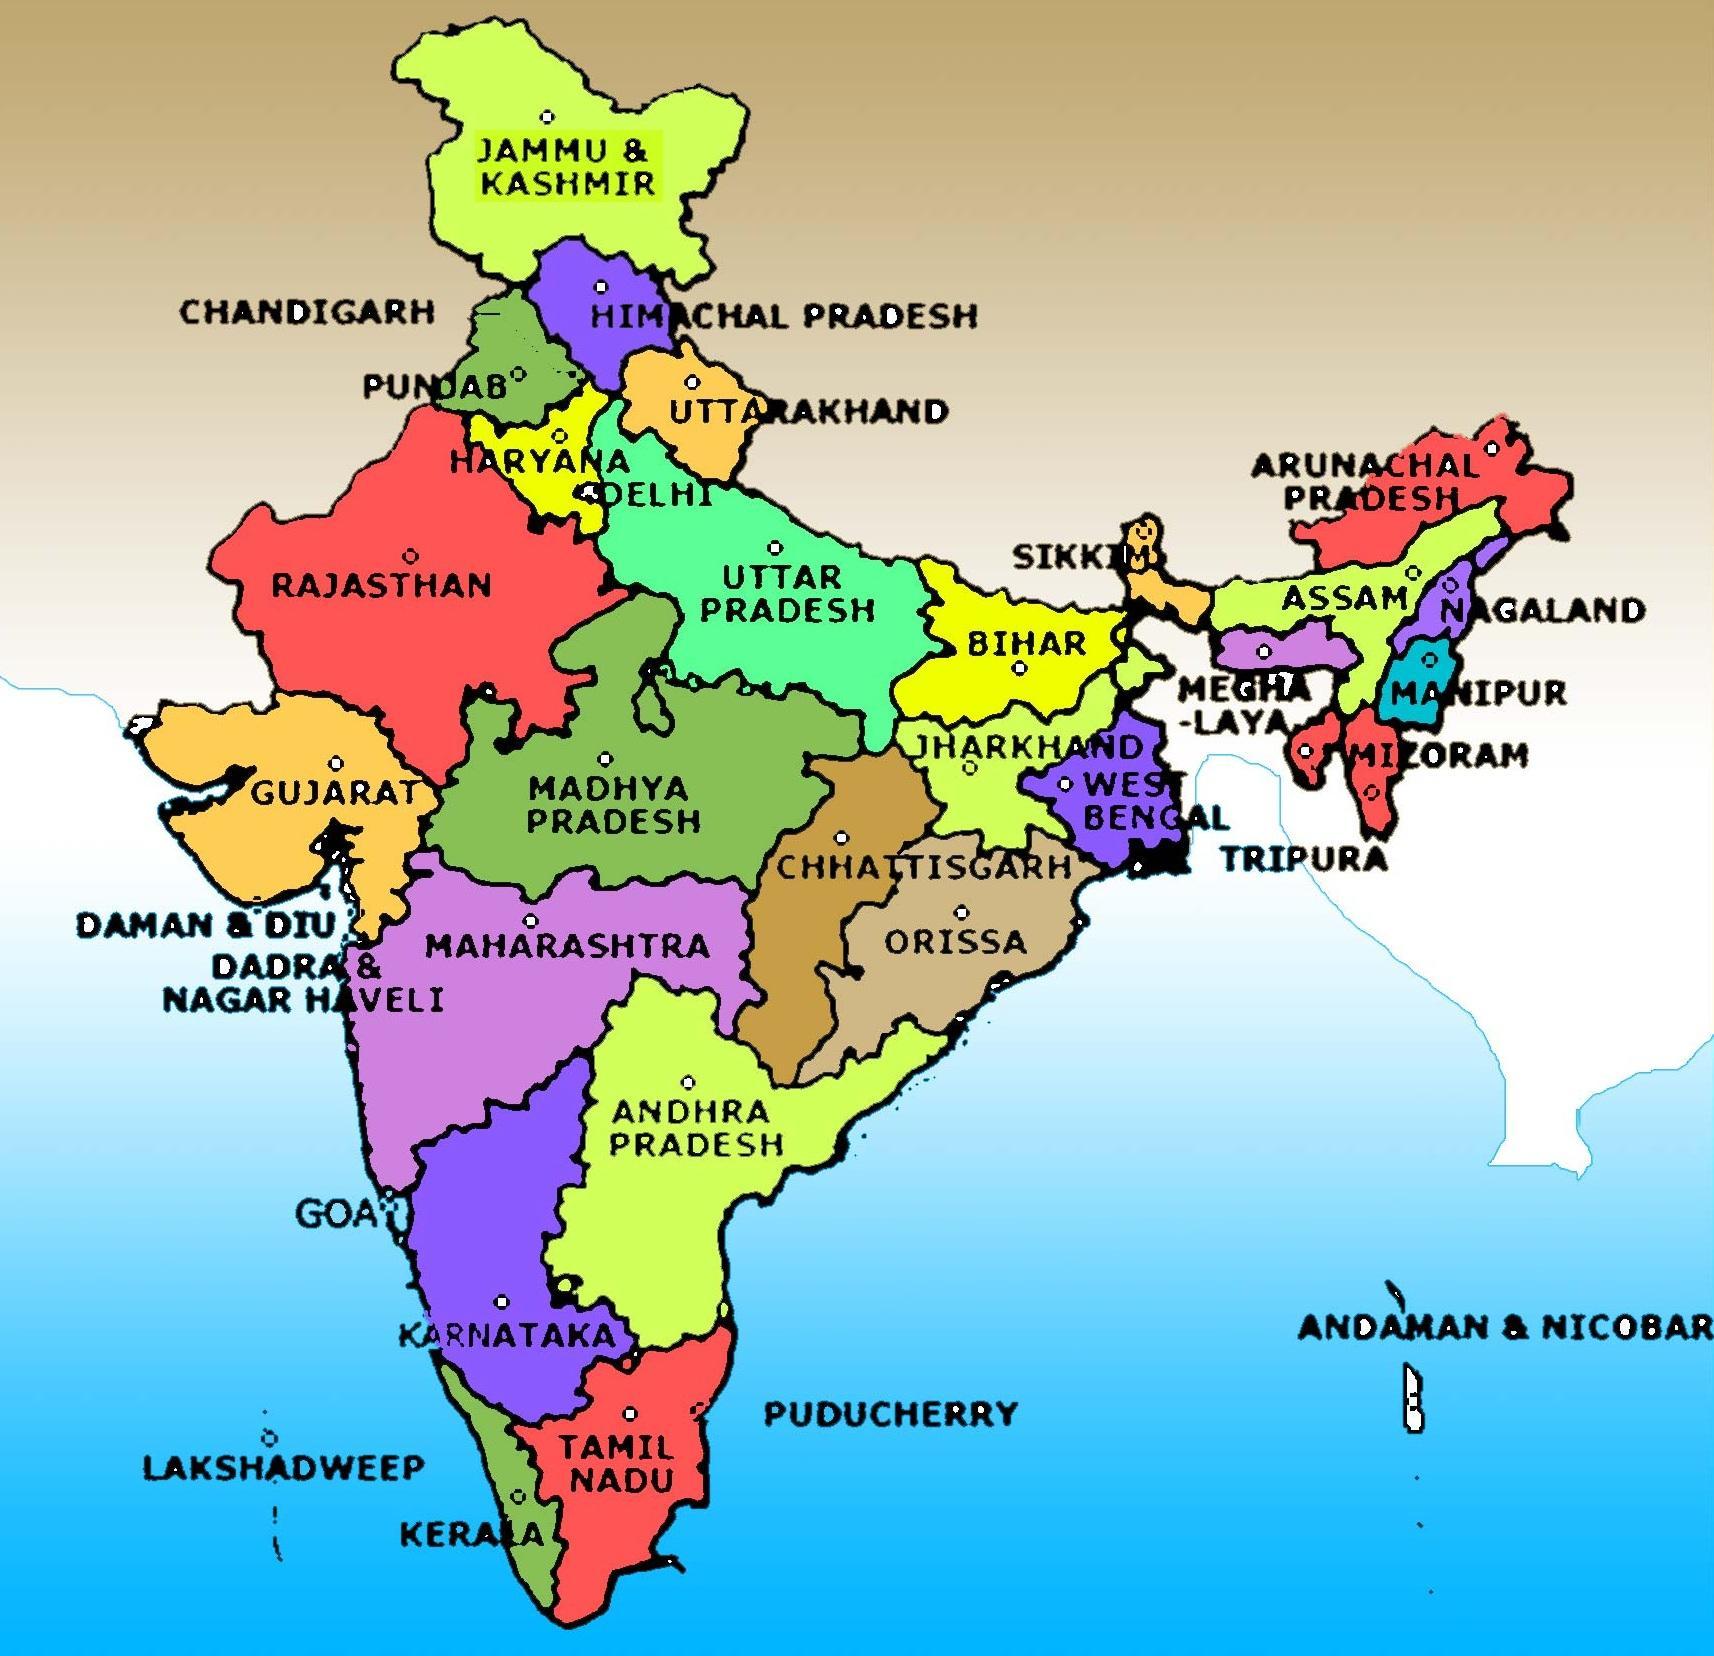 Indien Karta Bilden Med Statens Namn Karta Over Indien Bild Med